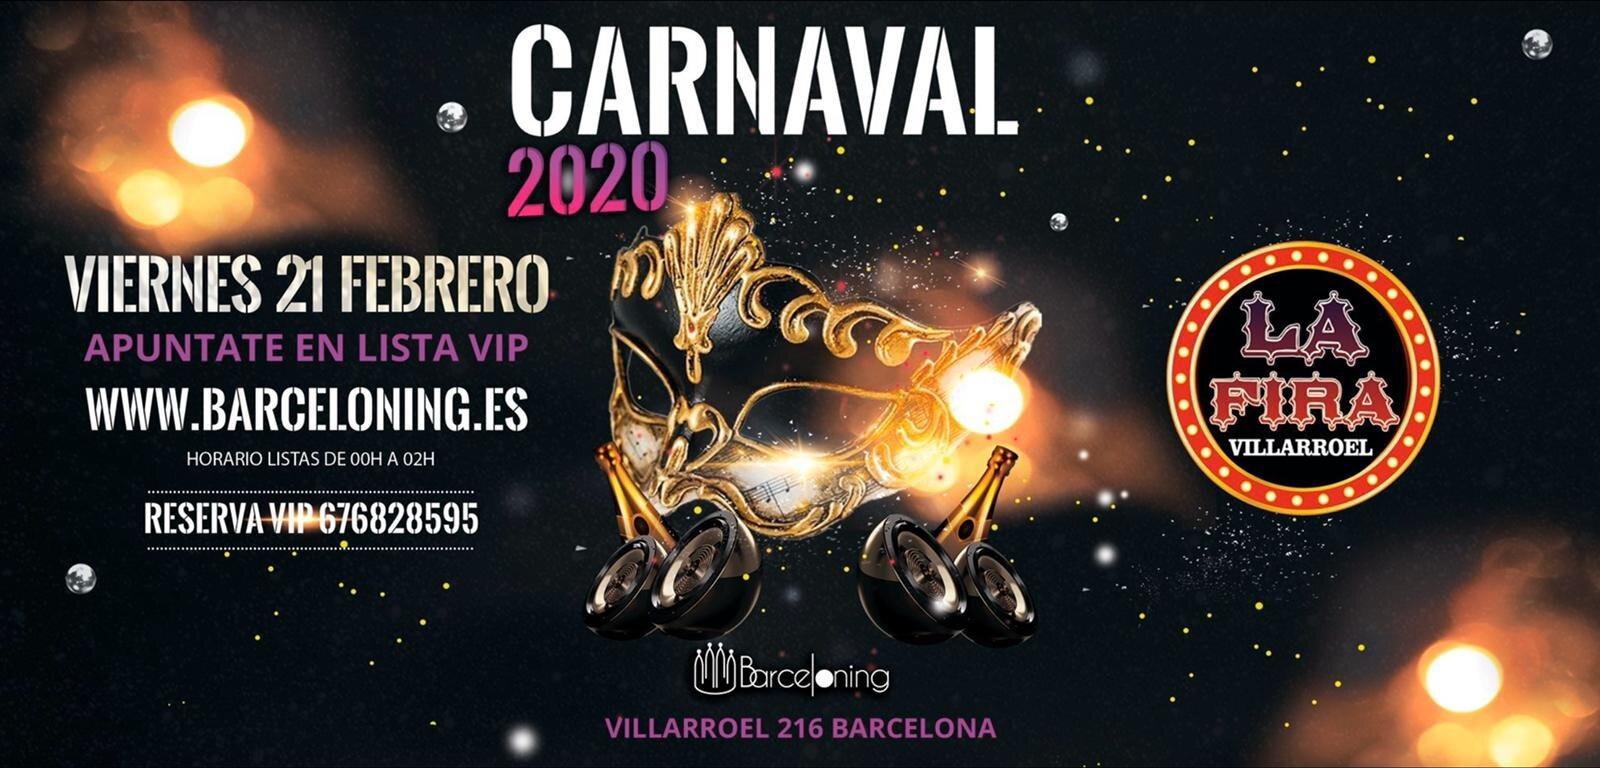 La Fira Villarroel - Carnaval Edition - Club LA FIRA VILLARROEL